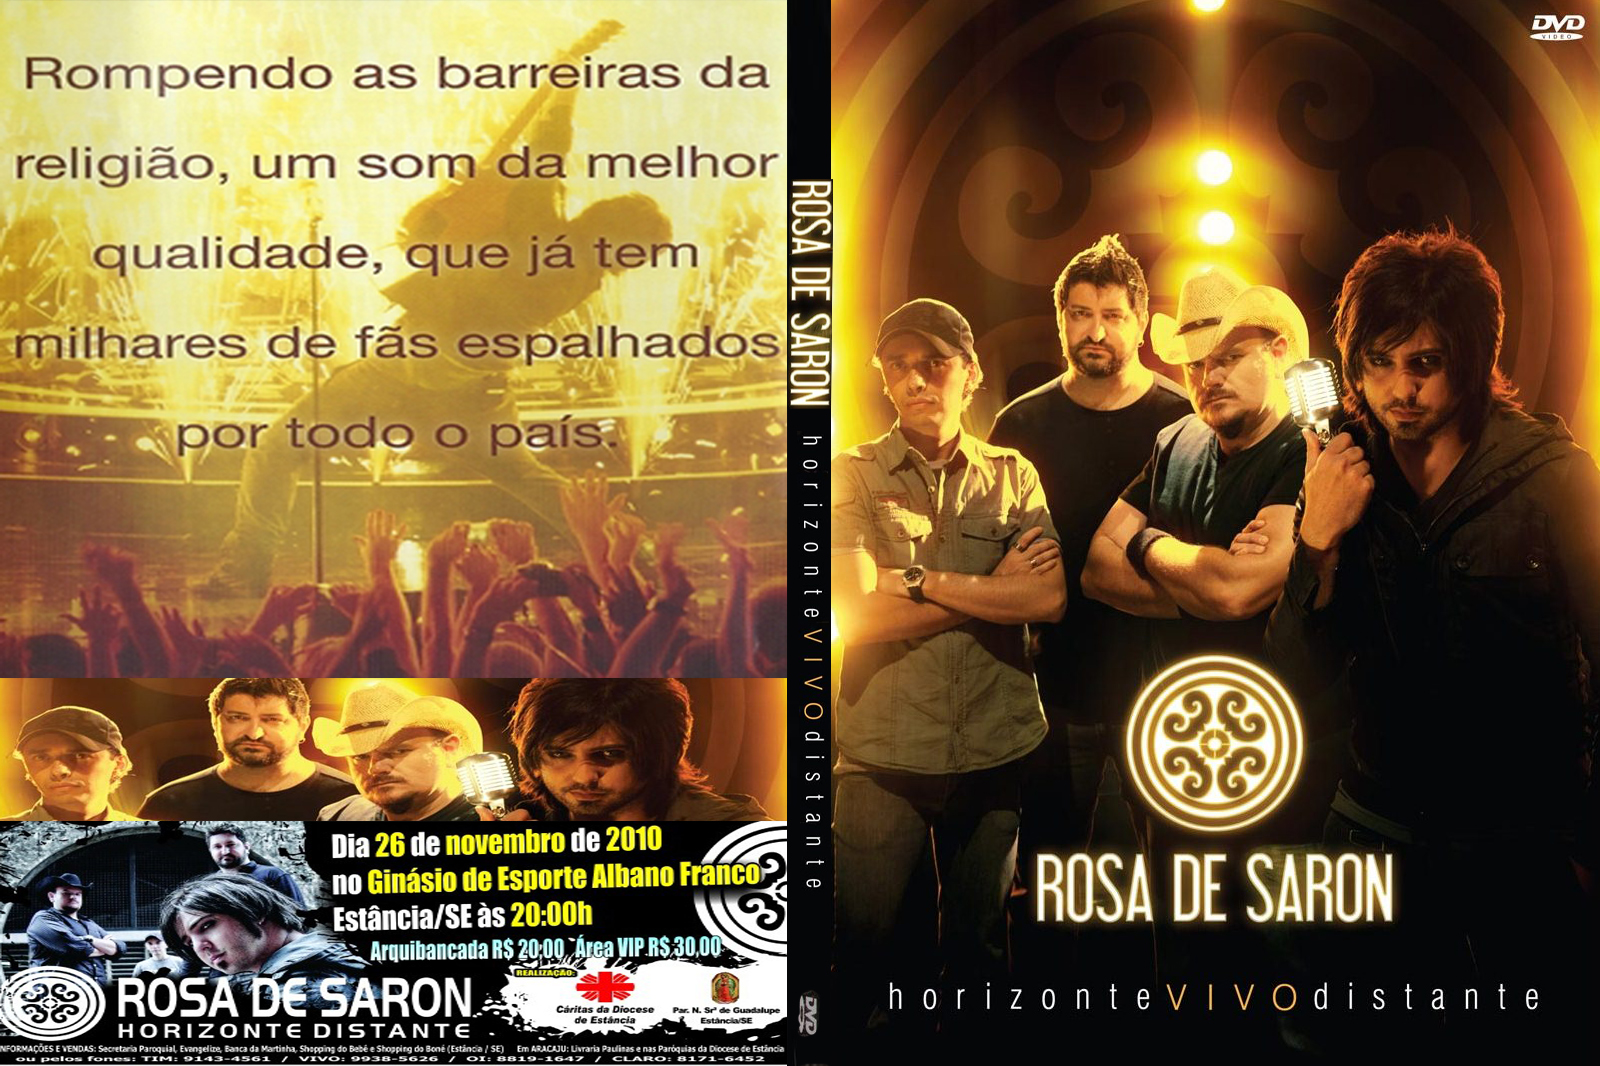 dvd rosa de saron horizonte vivo distante gratis